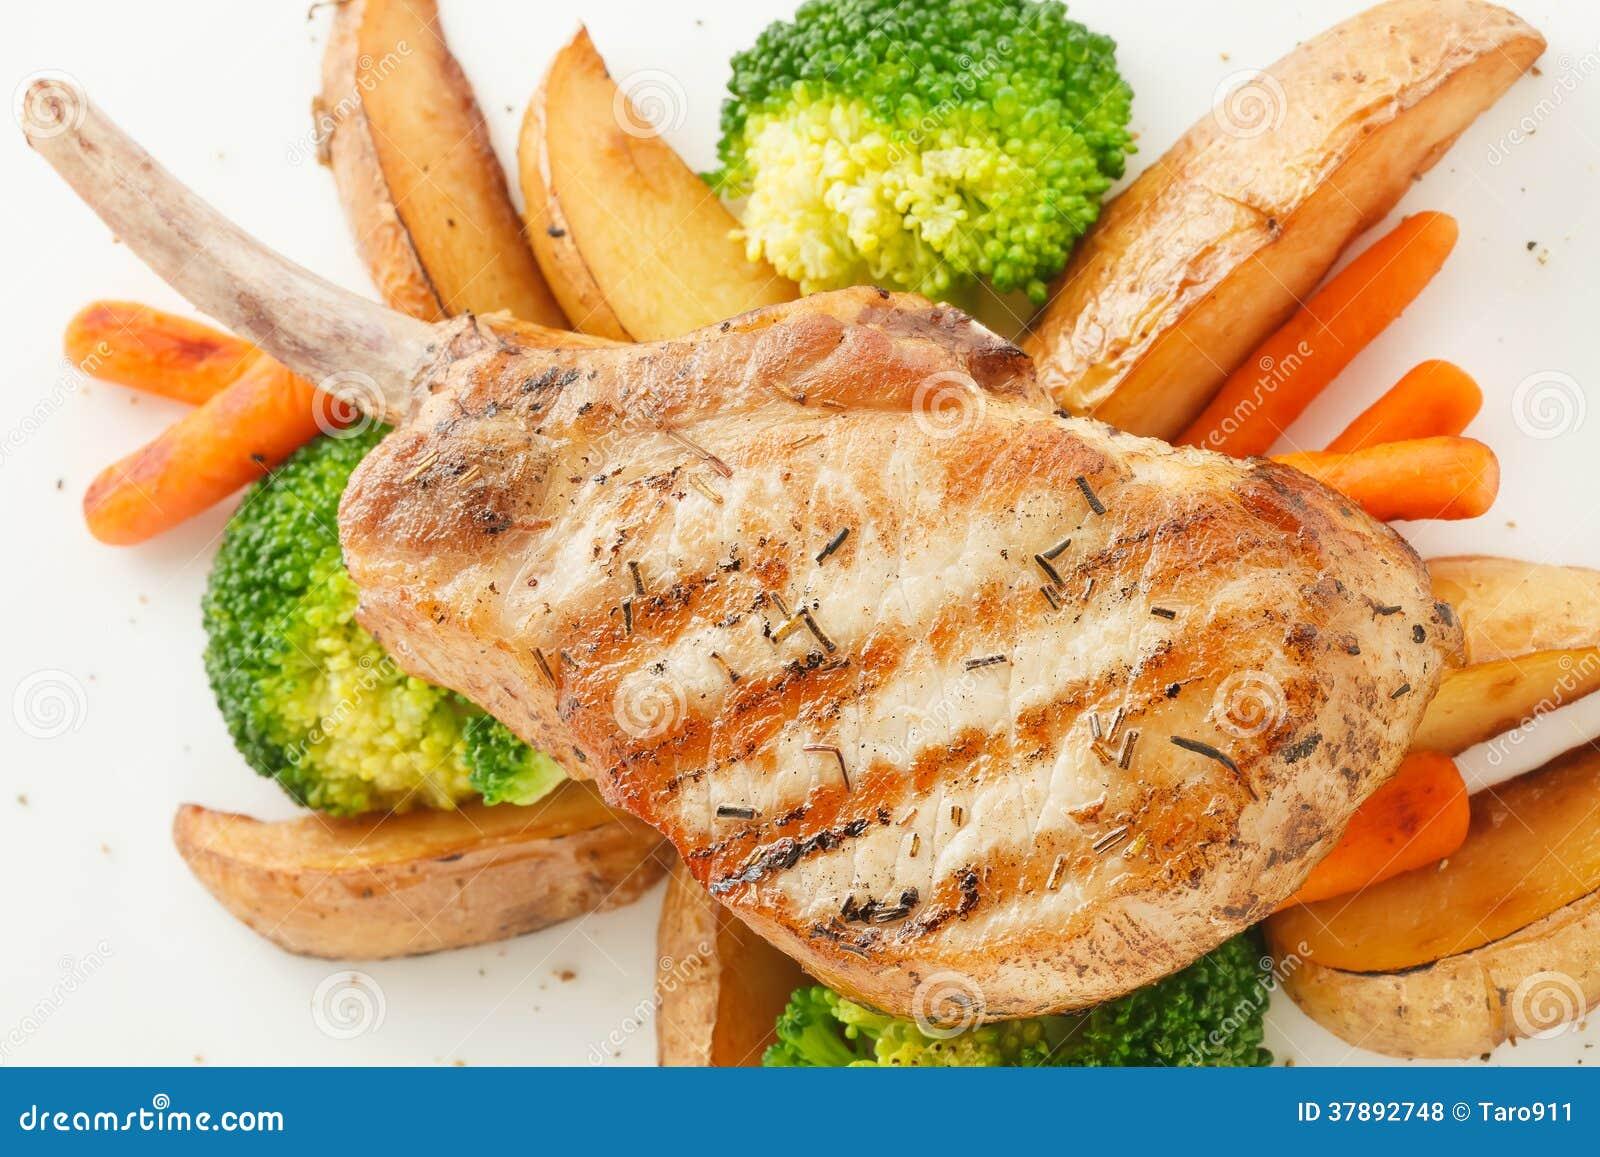 Het lapje vlees van de varkensvleesrib met grillgroente